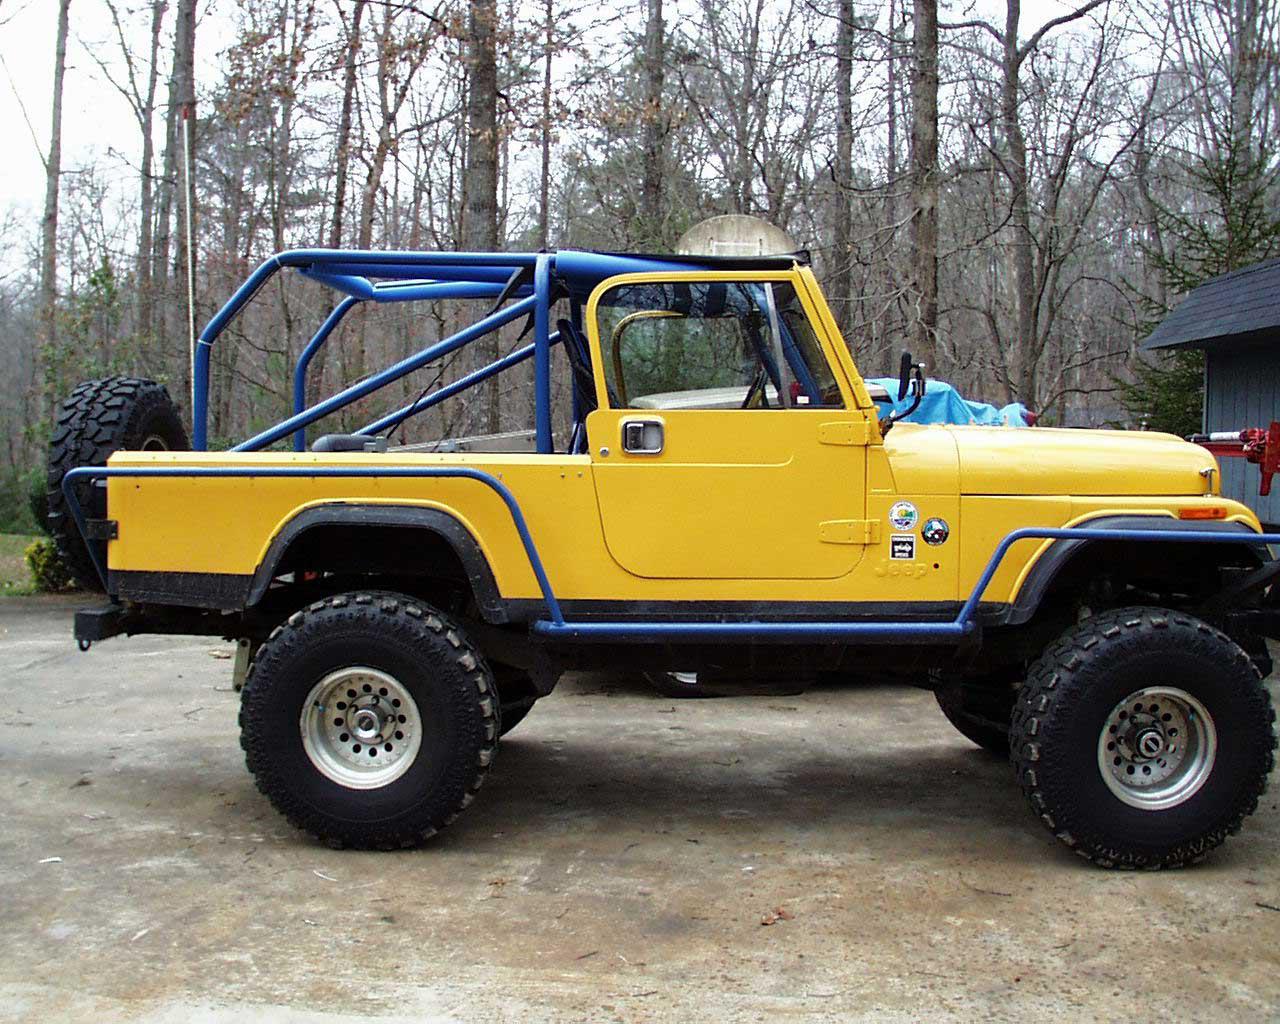 jeep wrangler cj 8 technical details history photos on better parts ltd. Black Bedroom Furniture Sets. Home Design Ideas